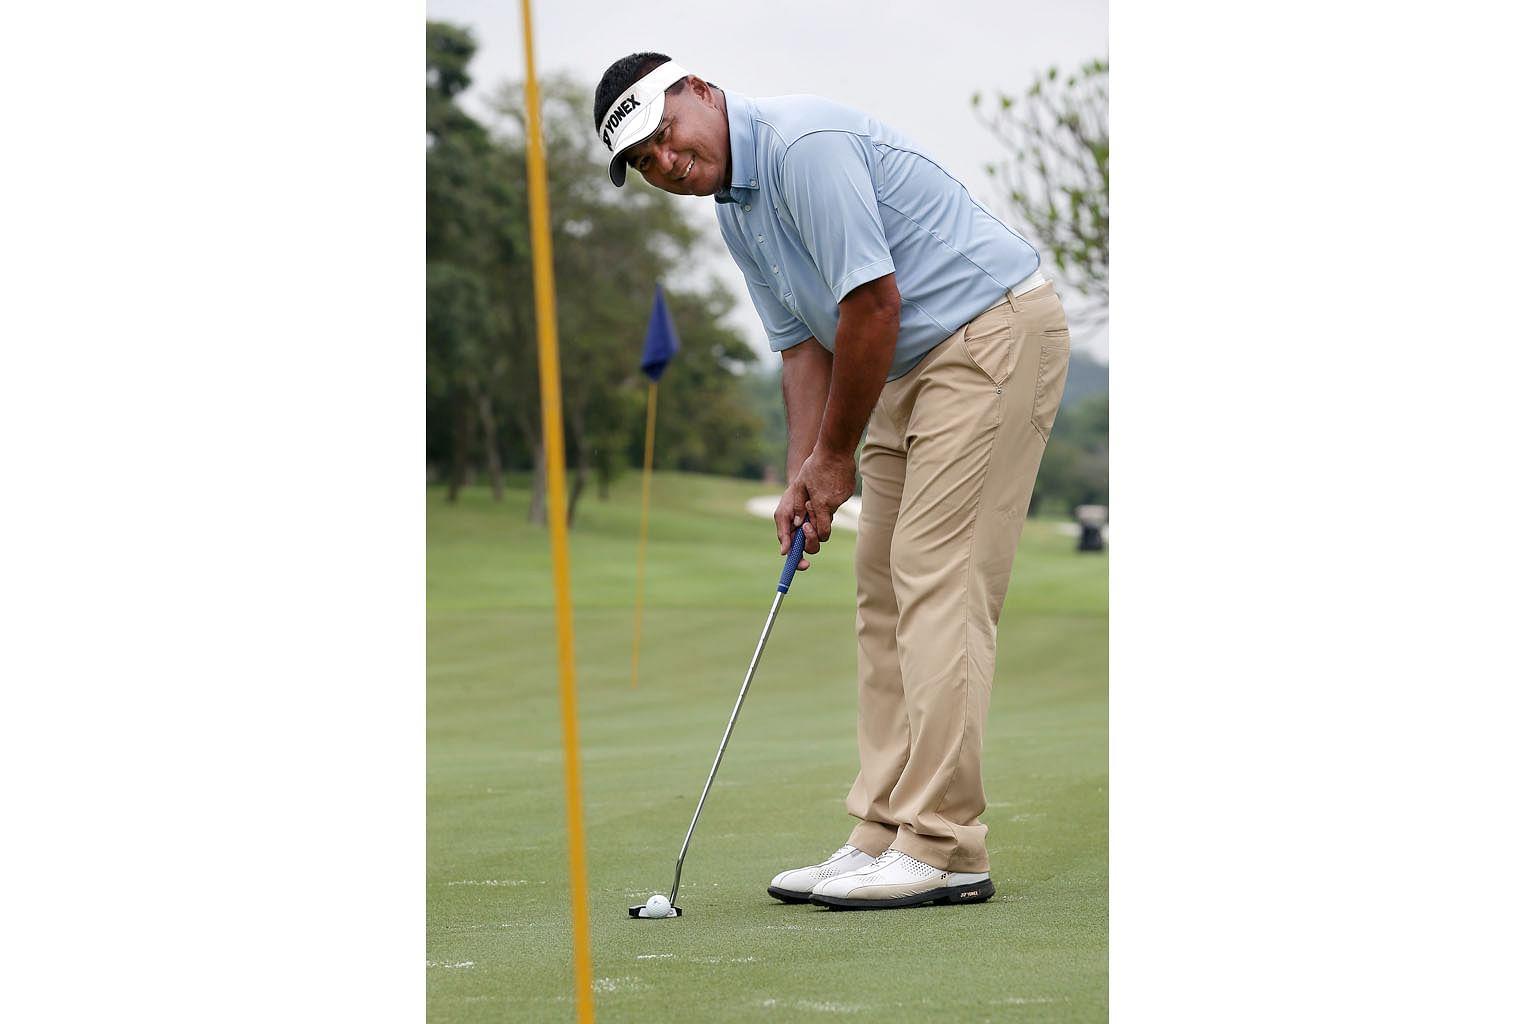 Golf Mardan Mamat S Still Hungry For Success At 50 Golf News